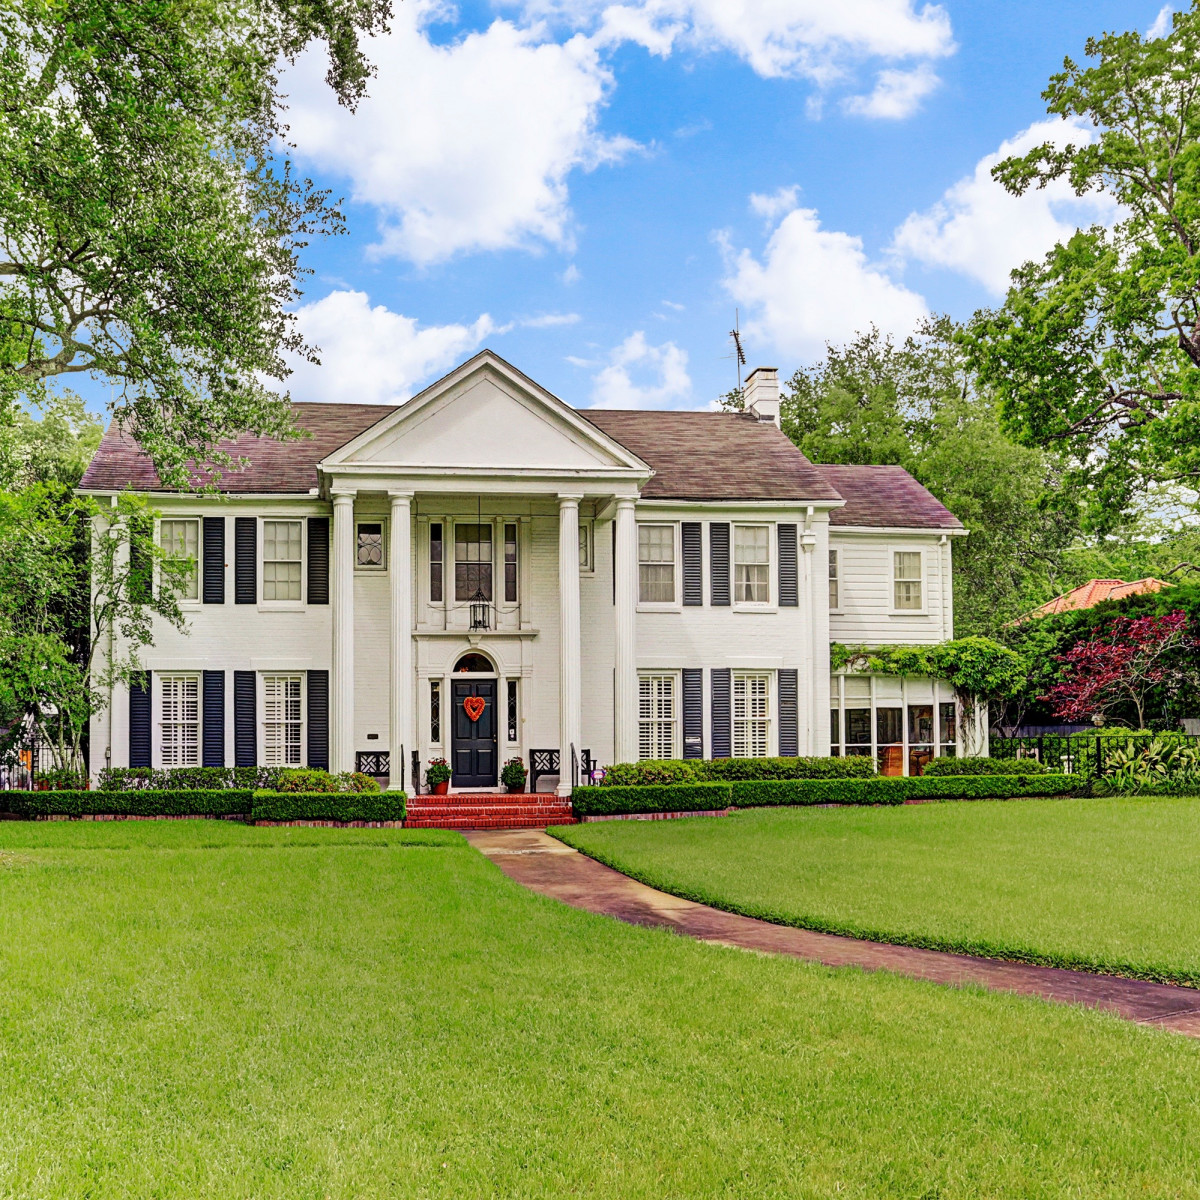 Denton Cooley River Oaks home for sale